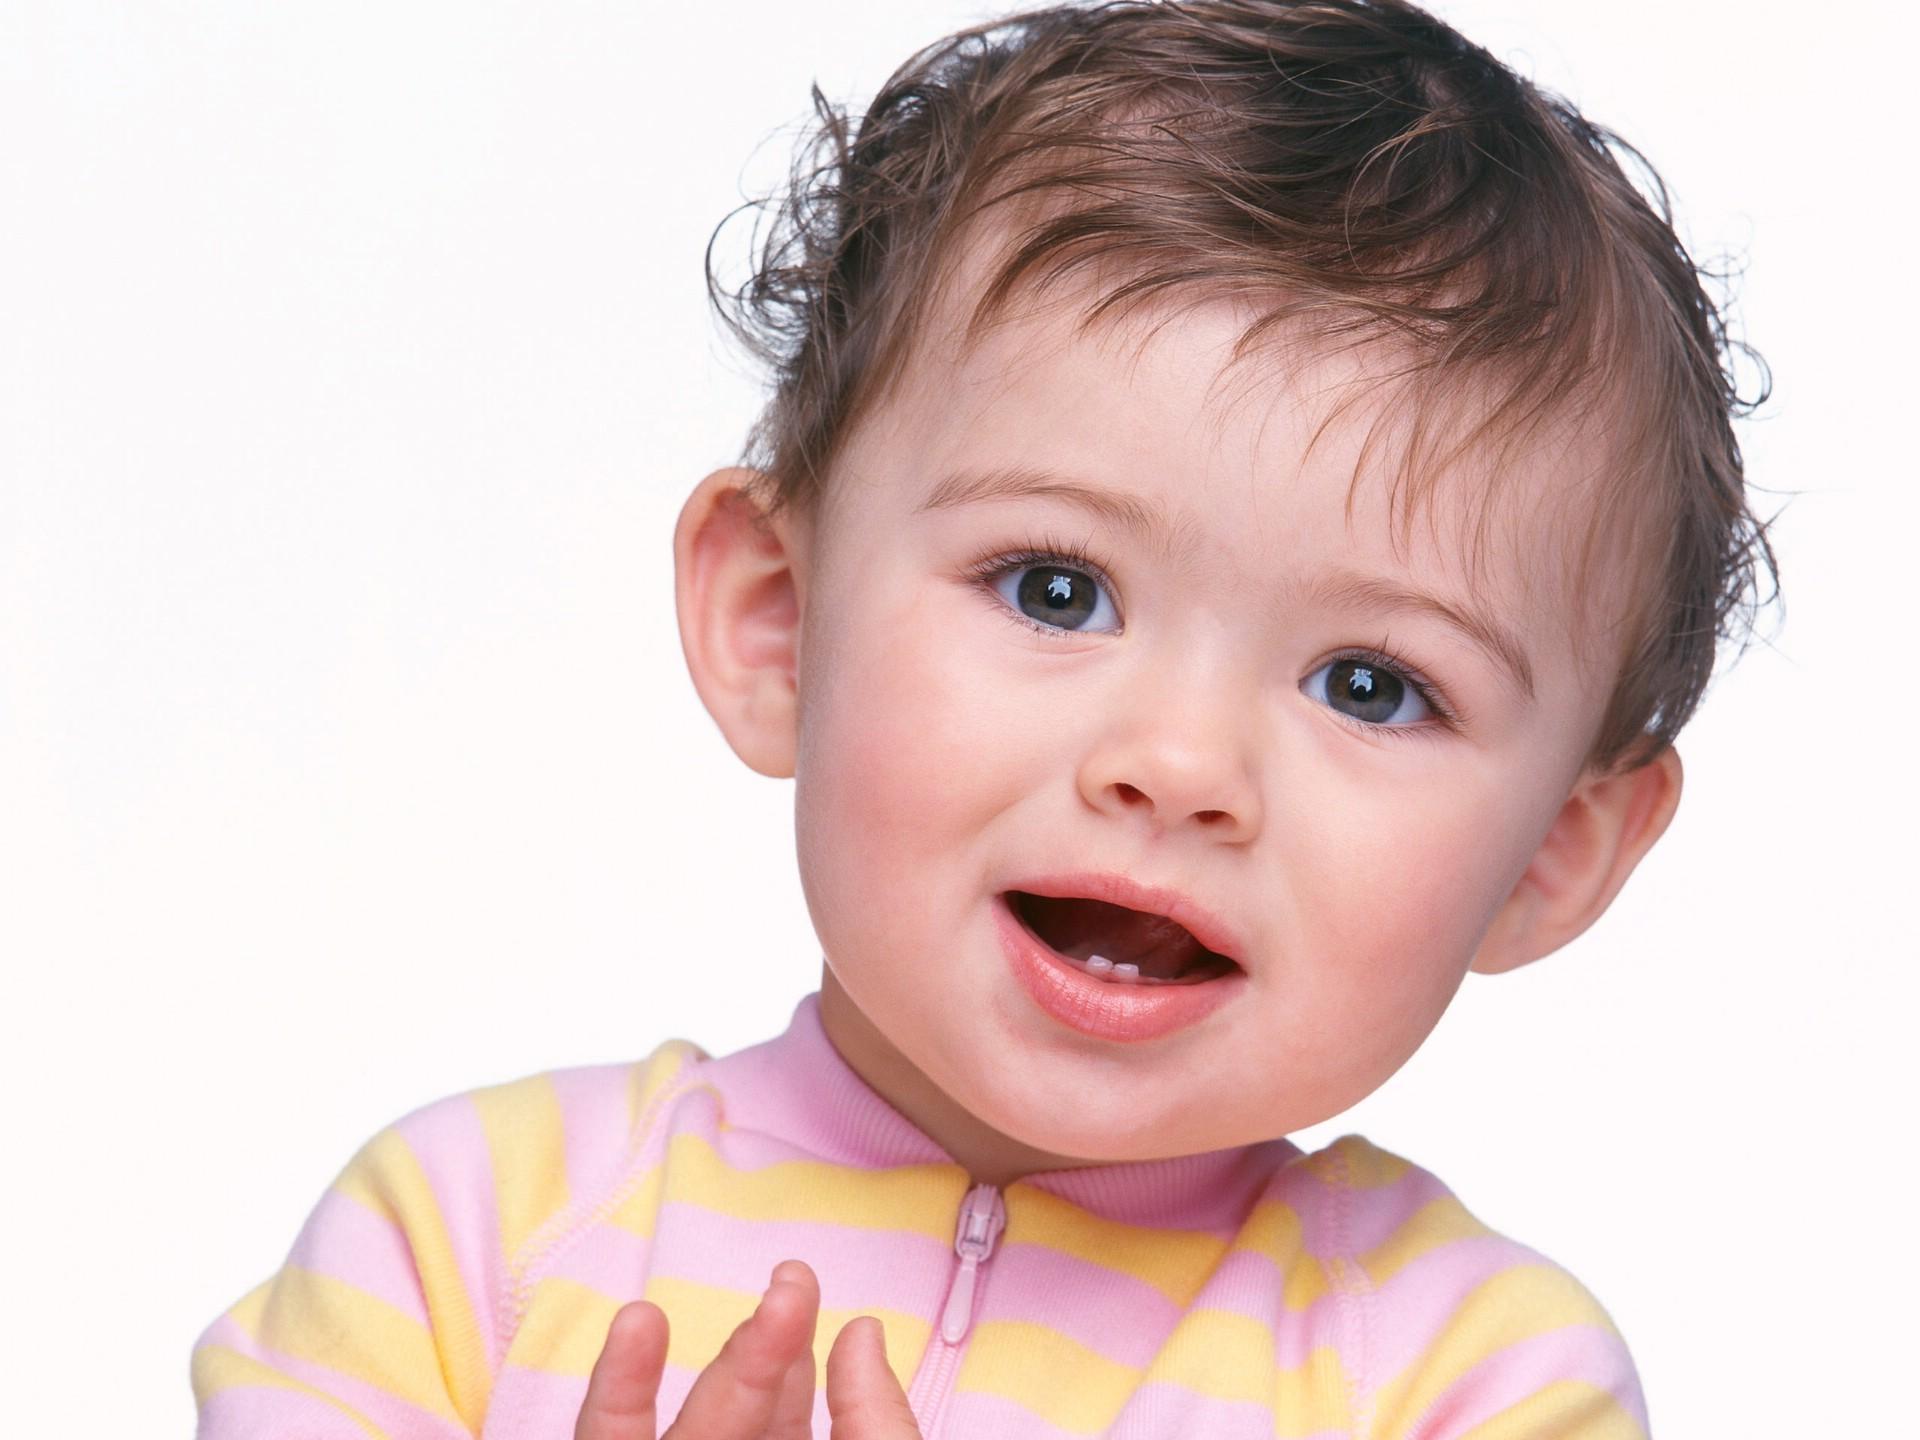 Cute Little Babies HQ 2 Wallpapers HD Wallpapers 1920x1440